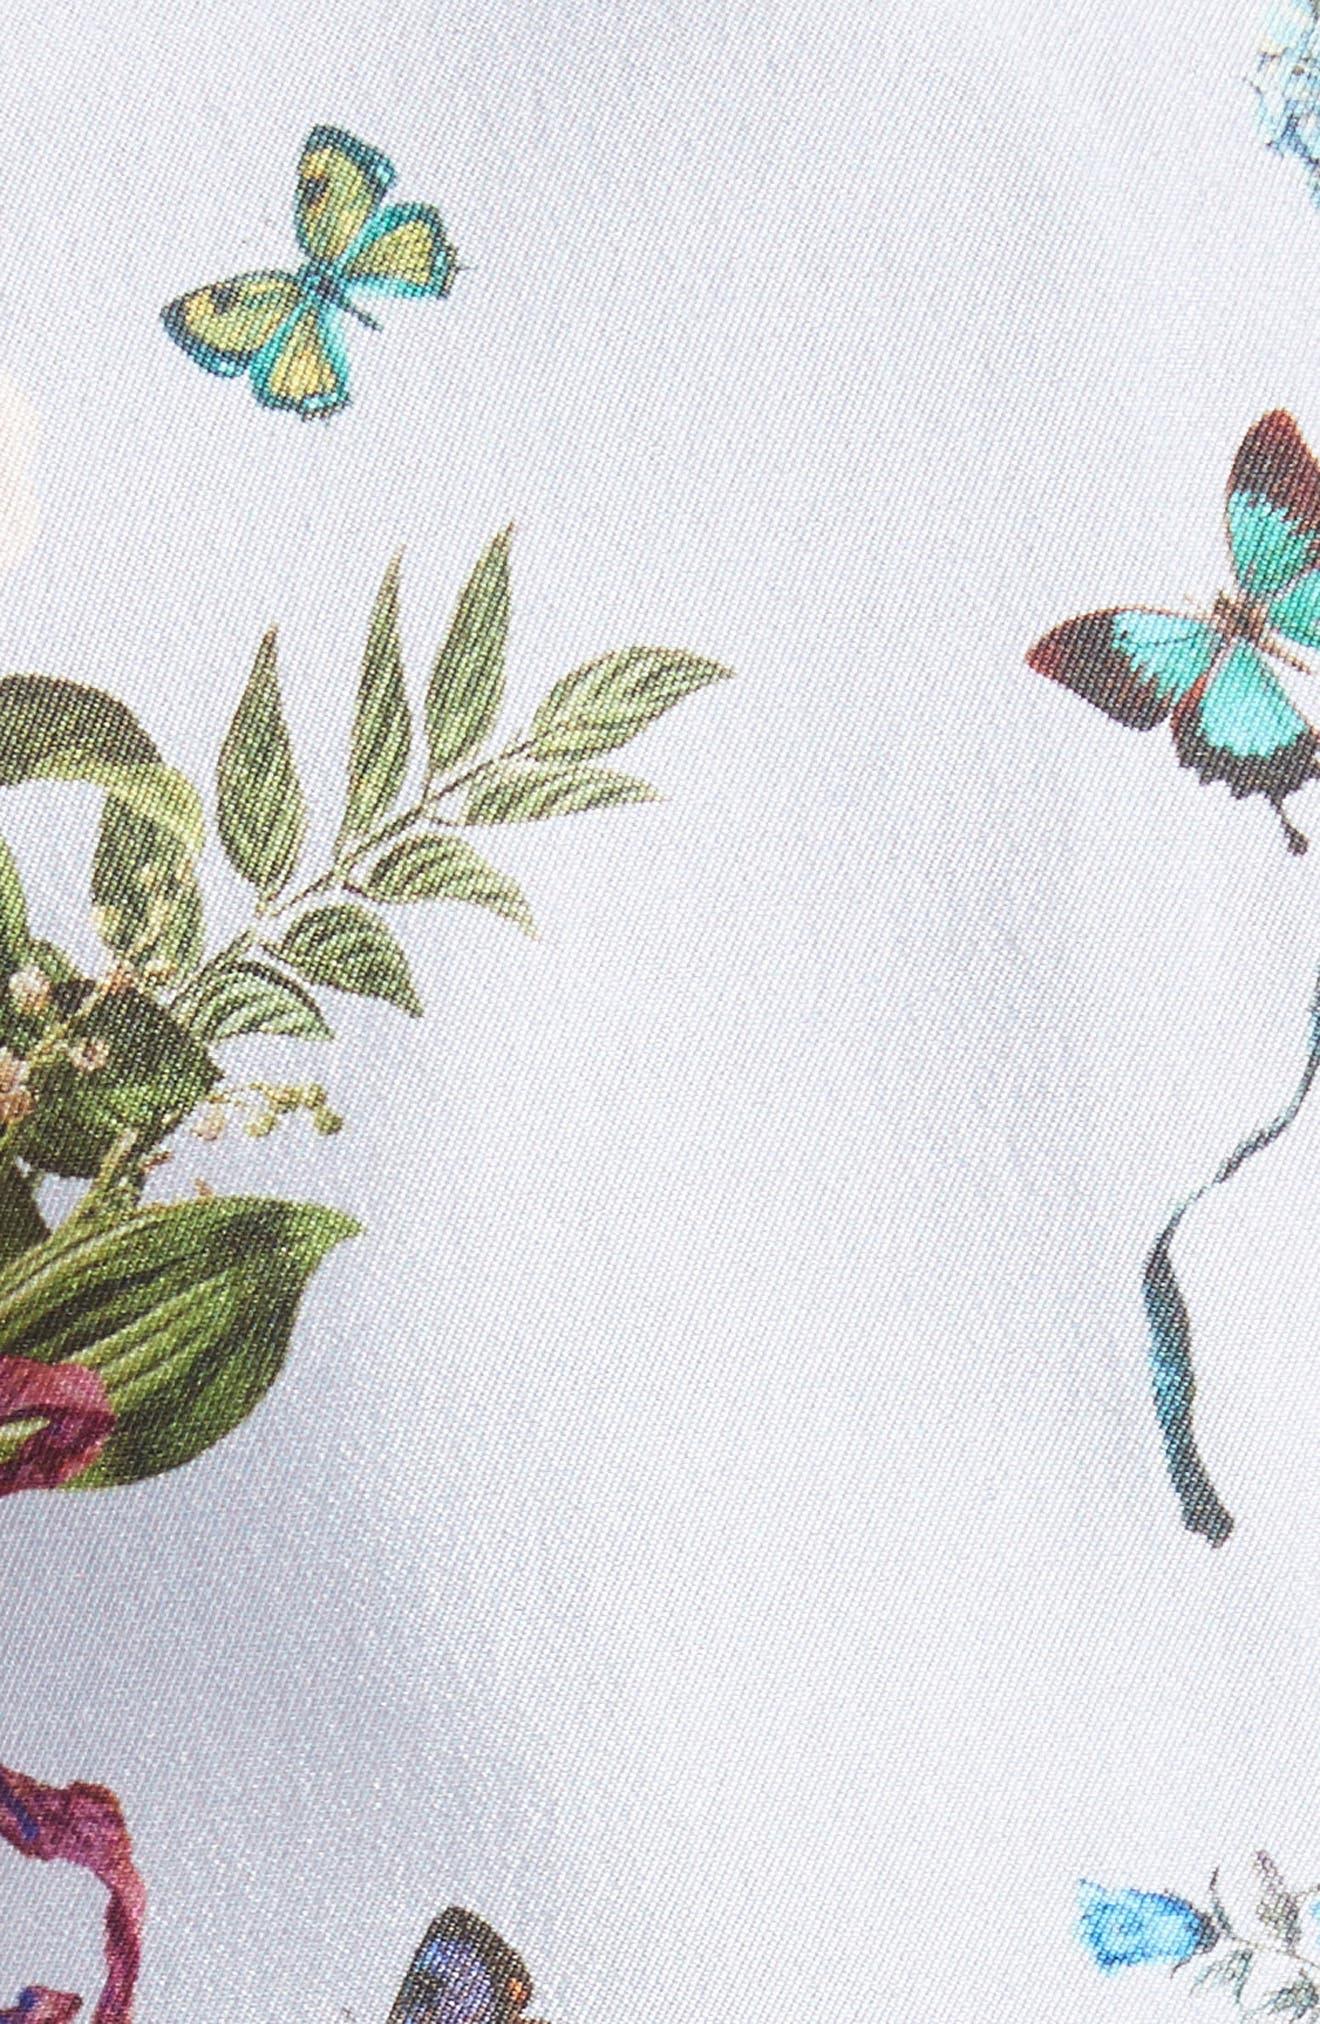 Botantical Print Structured Twill Dress,                             Alternate thumbnail 6, color,                             Lavender Multi